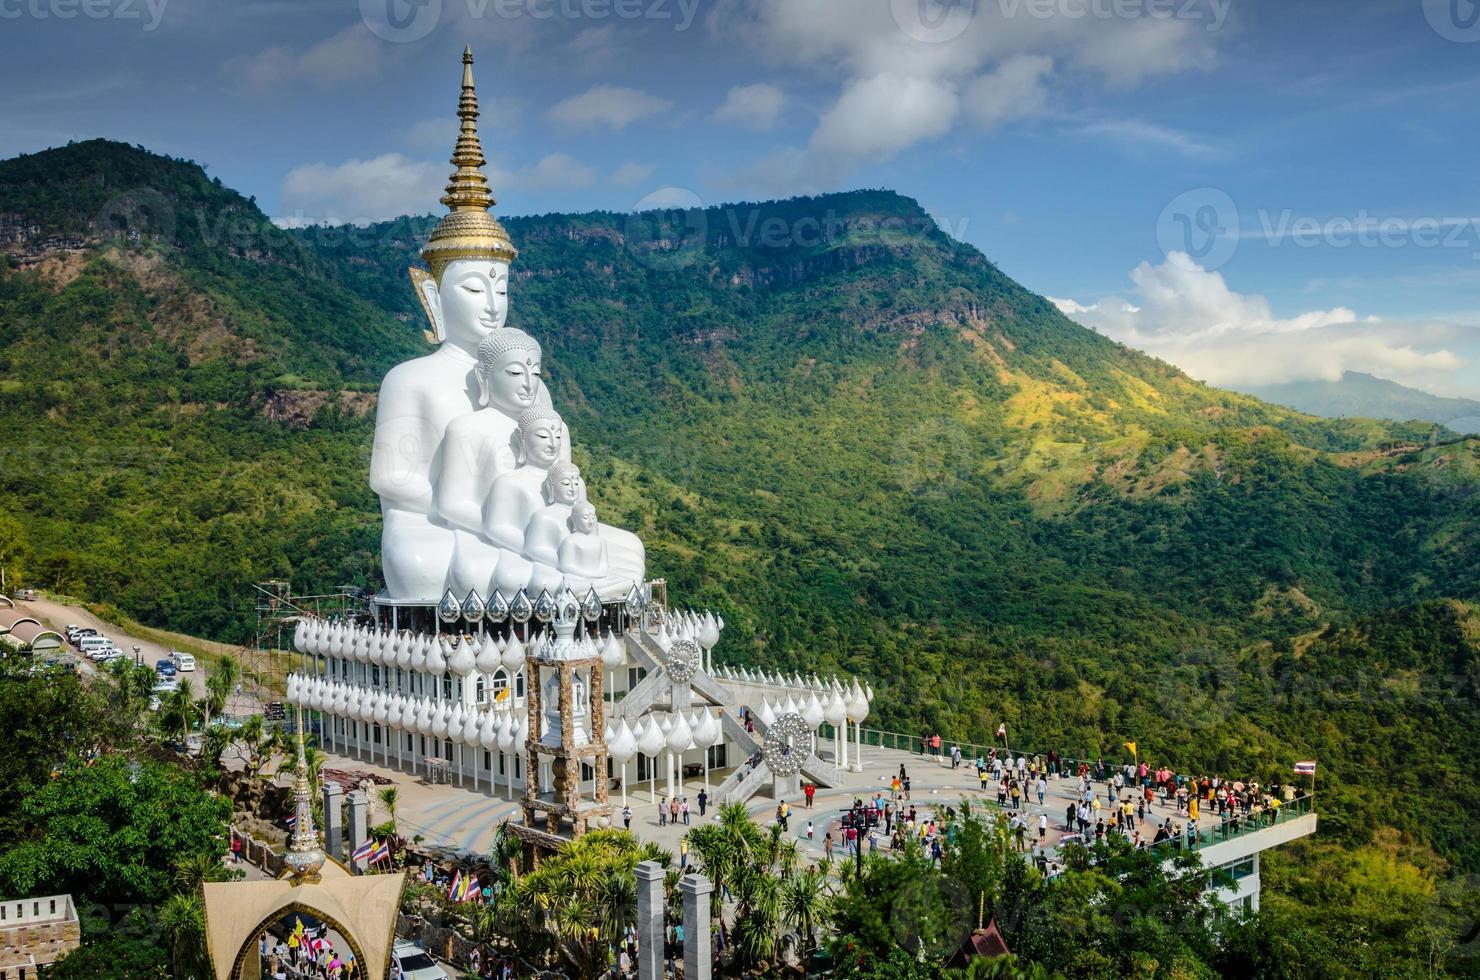 White big Buddha on the mountain, Wat Pha Sorn Kaew photo